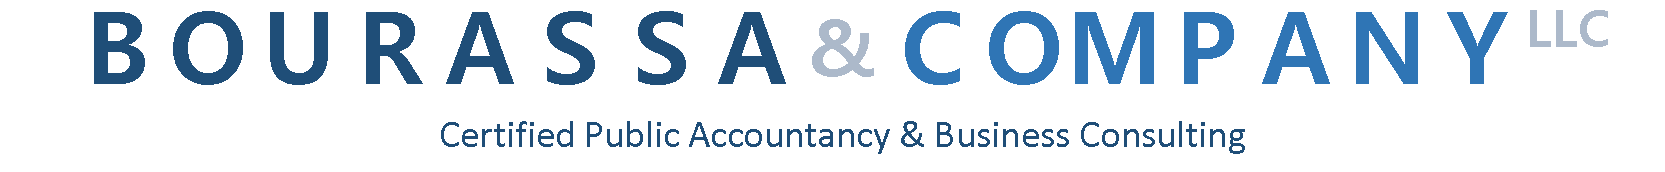 Kensington, CT Accounting Firm | QuickBooks Tips Page | Bourassa & Company, LLC